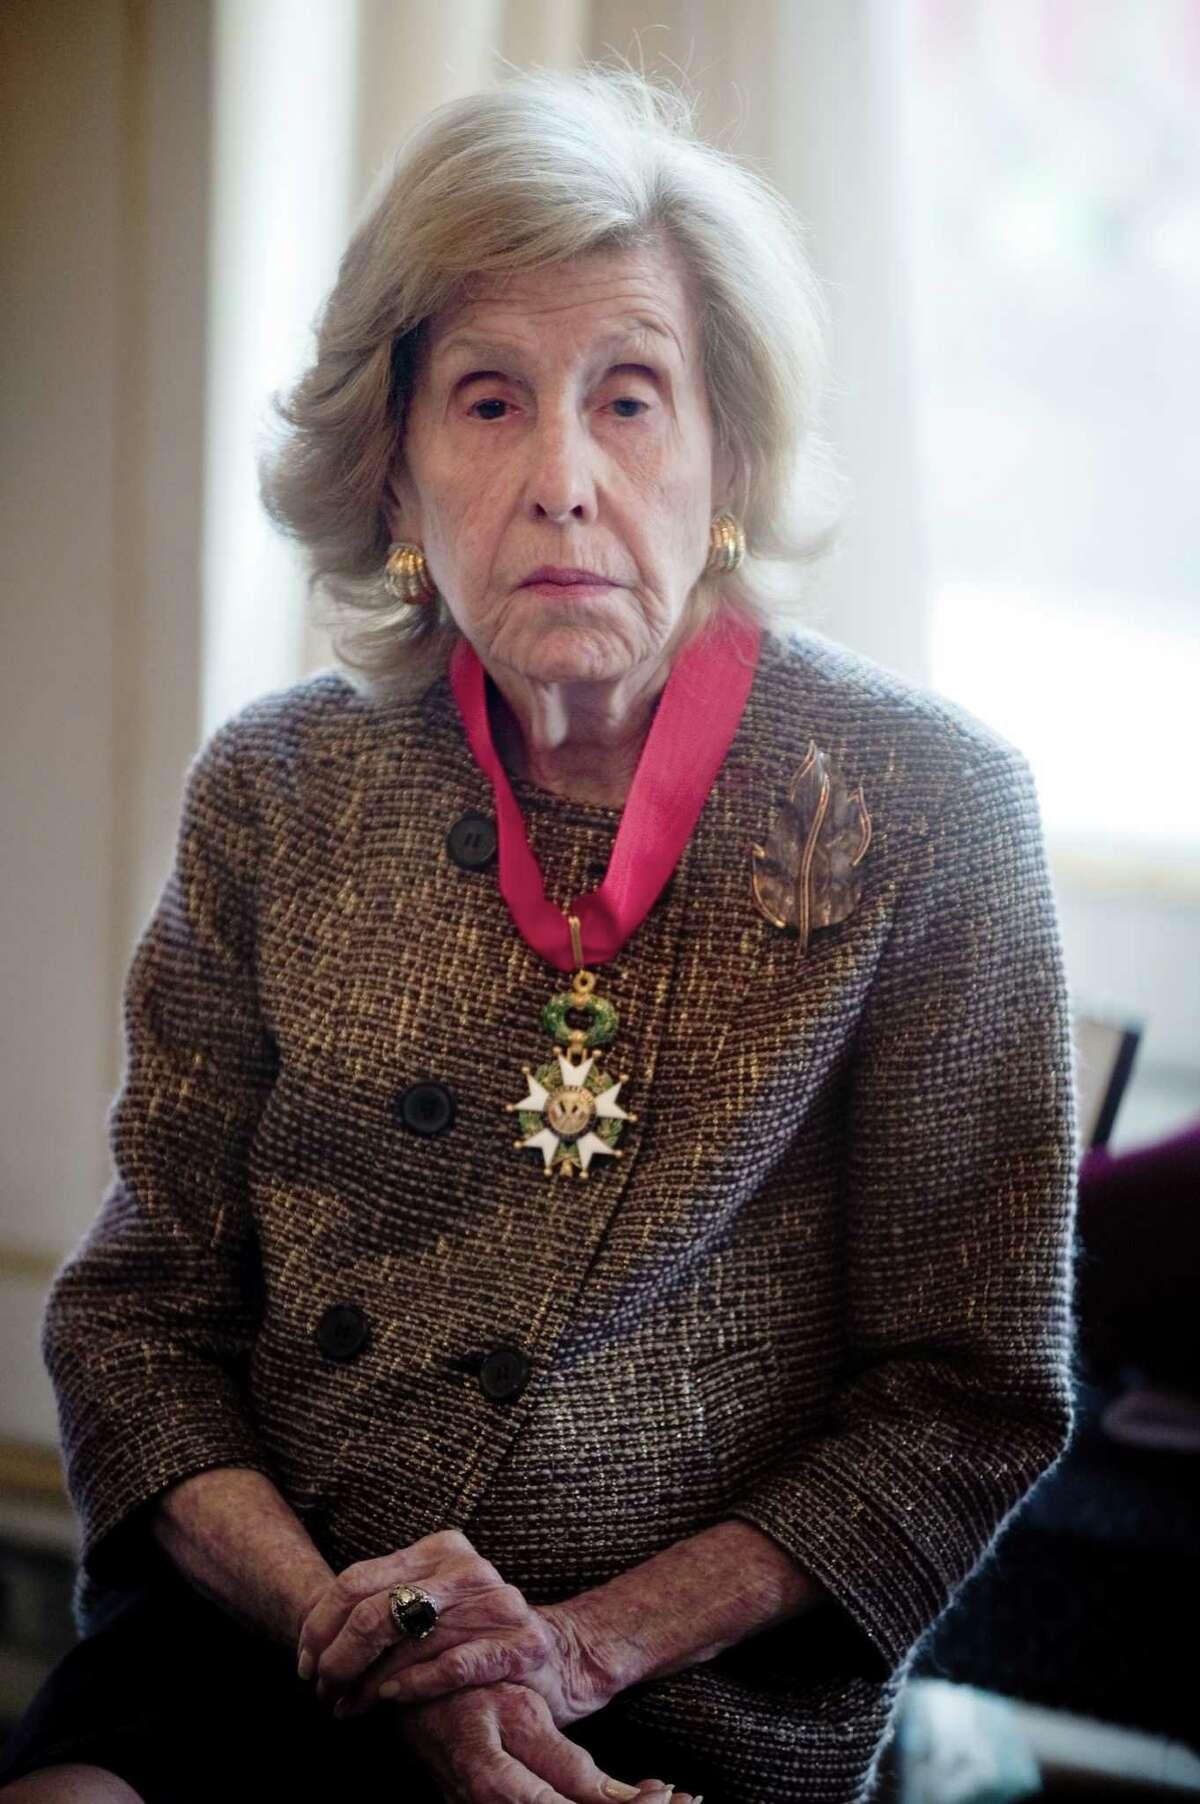 25. Anne Cox Chambers Age: 95 Net worth: $18 billion Industry: Media Residence: Georgia Inherited or self-made: Inherited